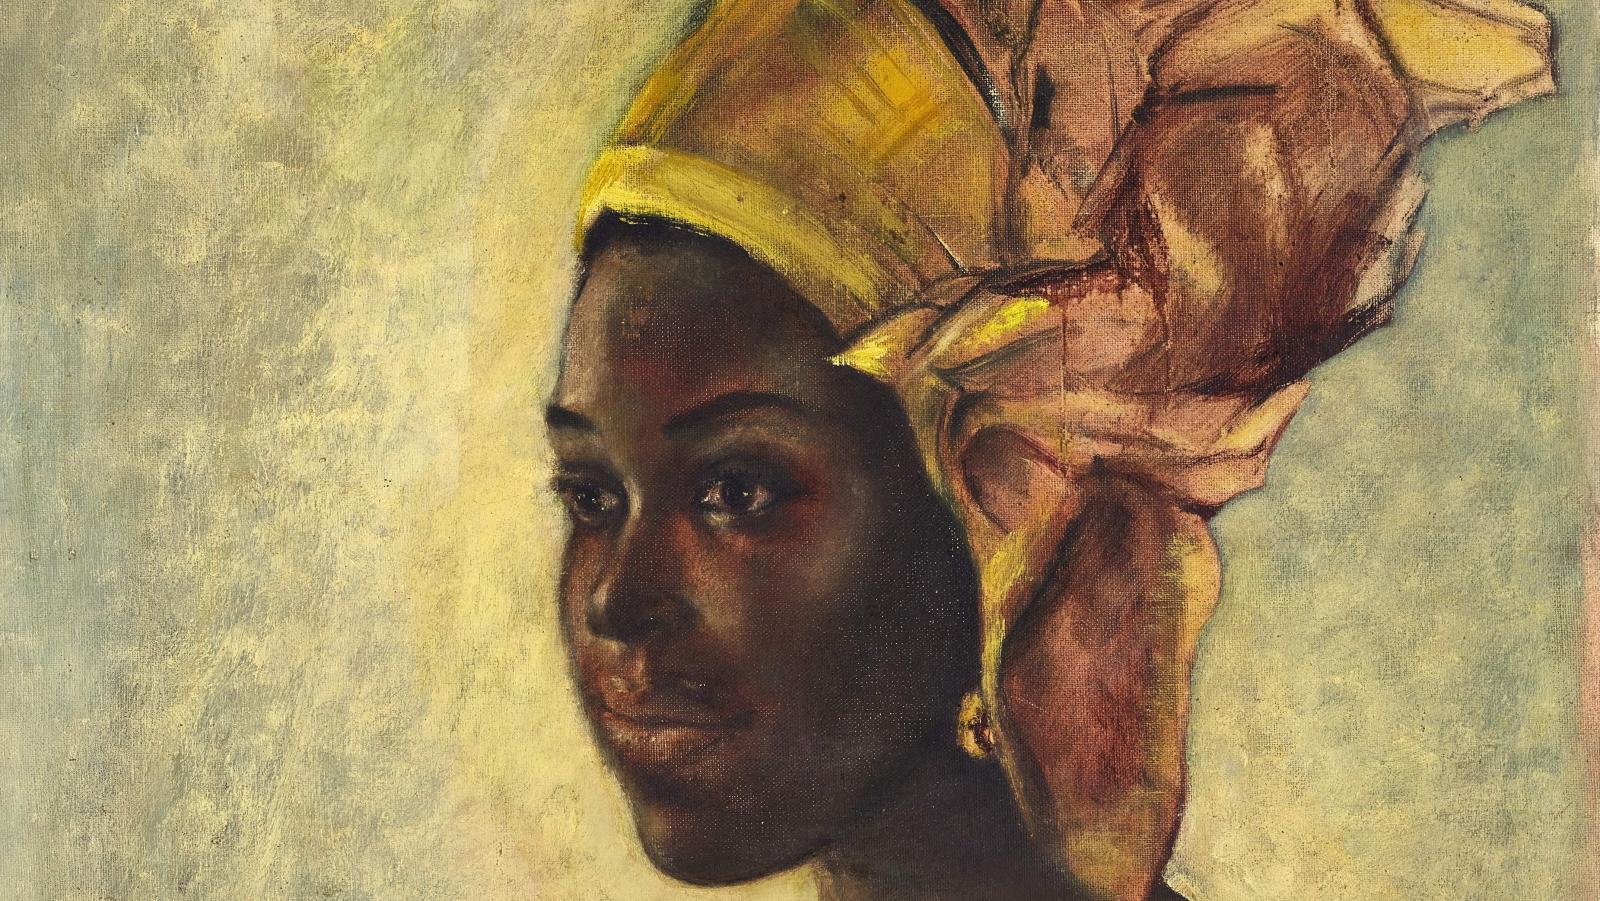 Christine Ben Enwonwu's Painting Sold for 1.4 million dollars